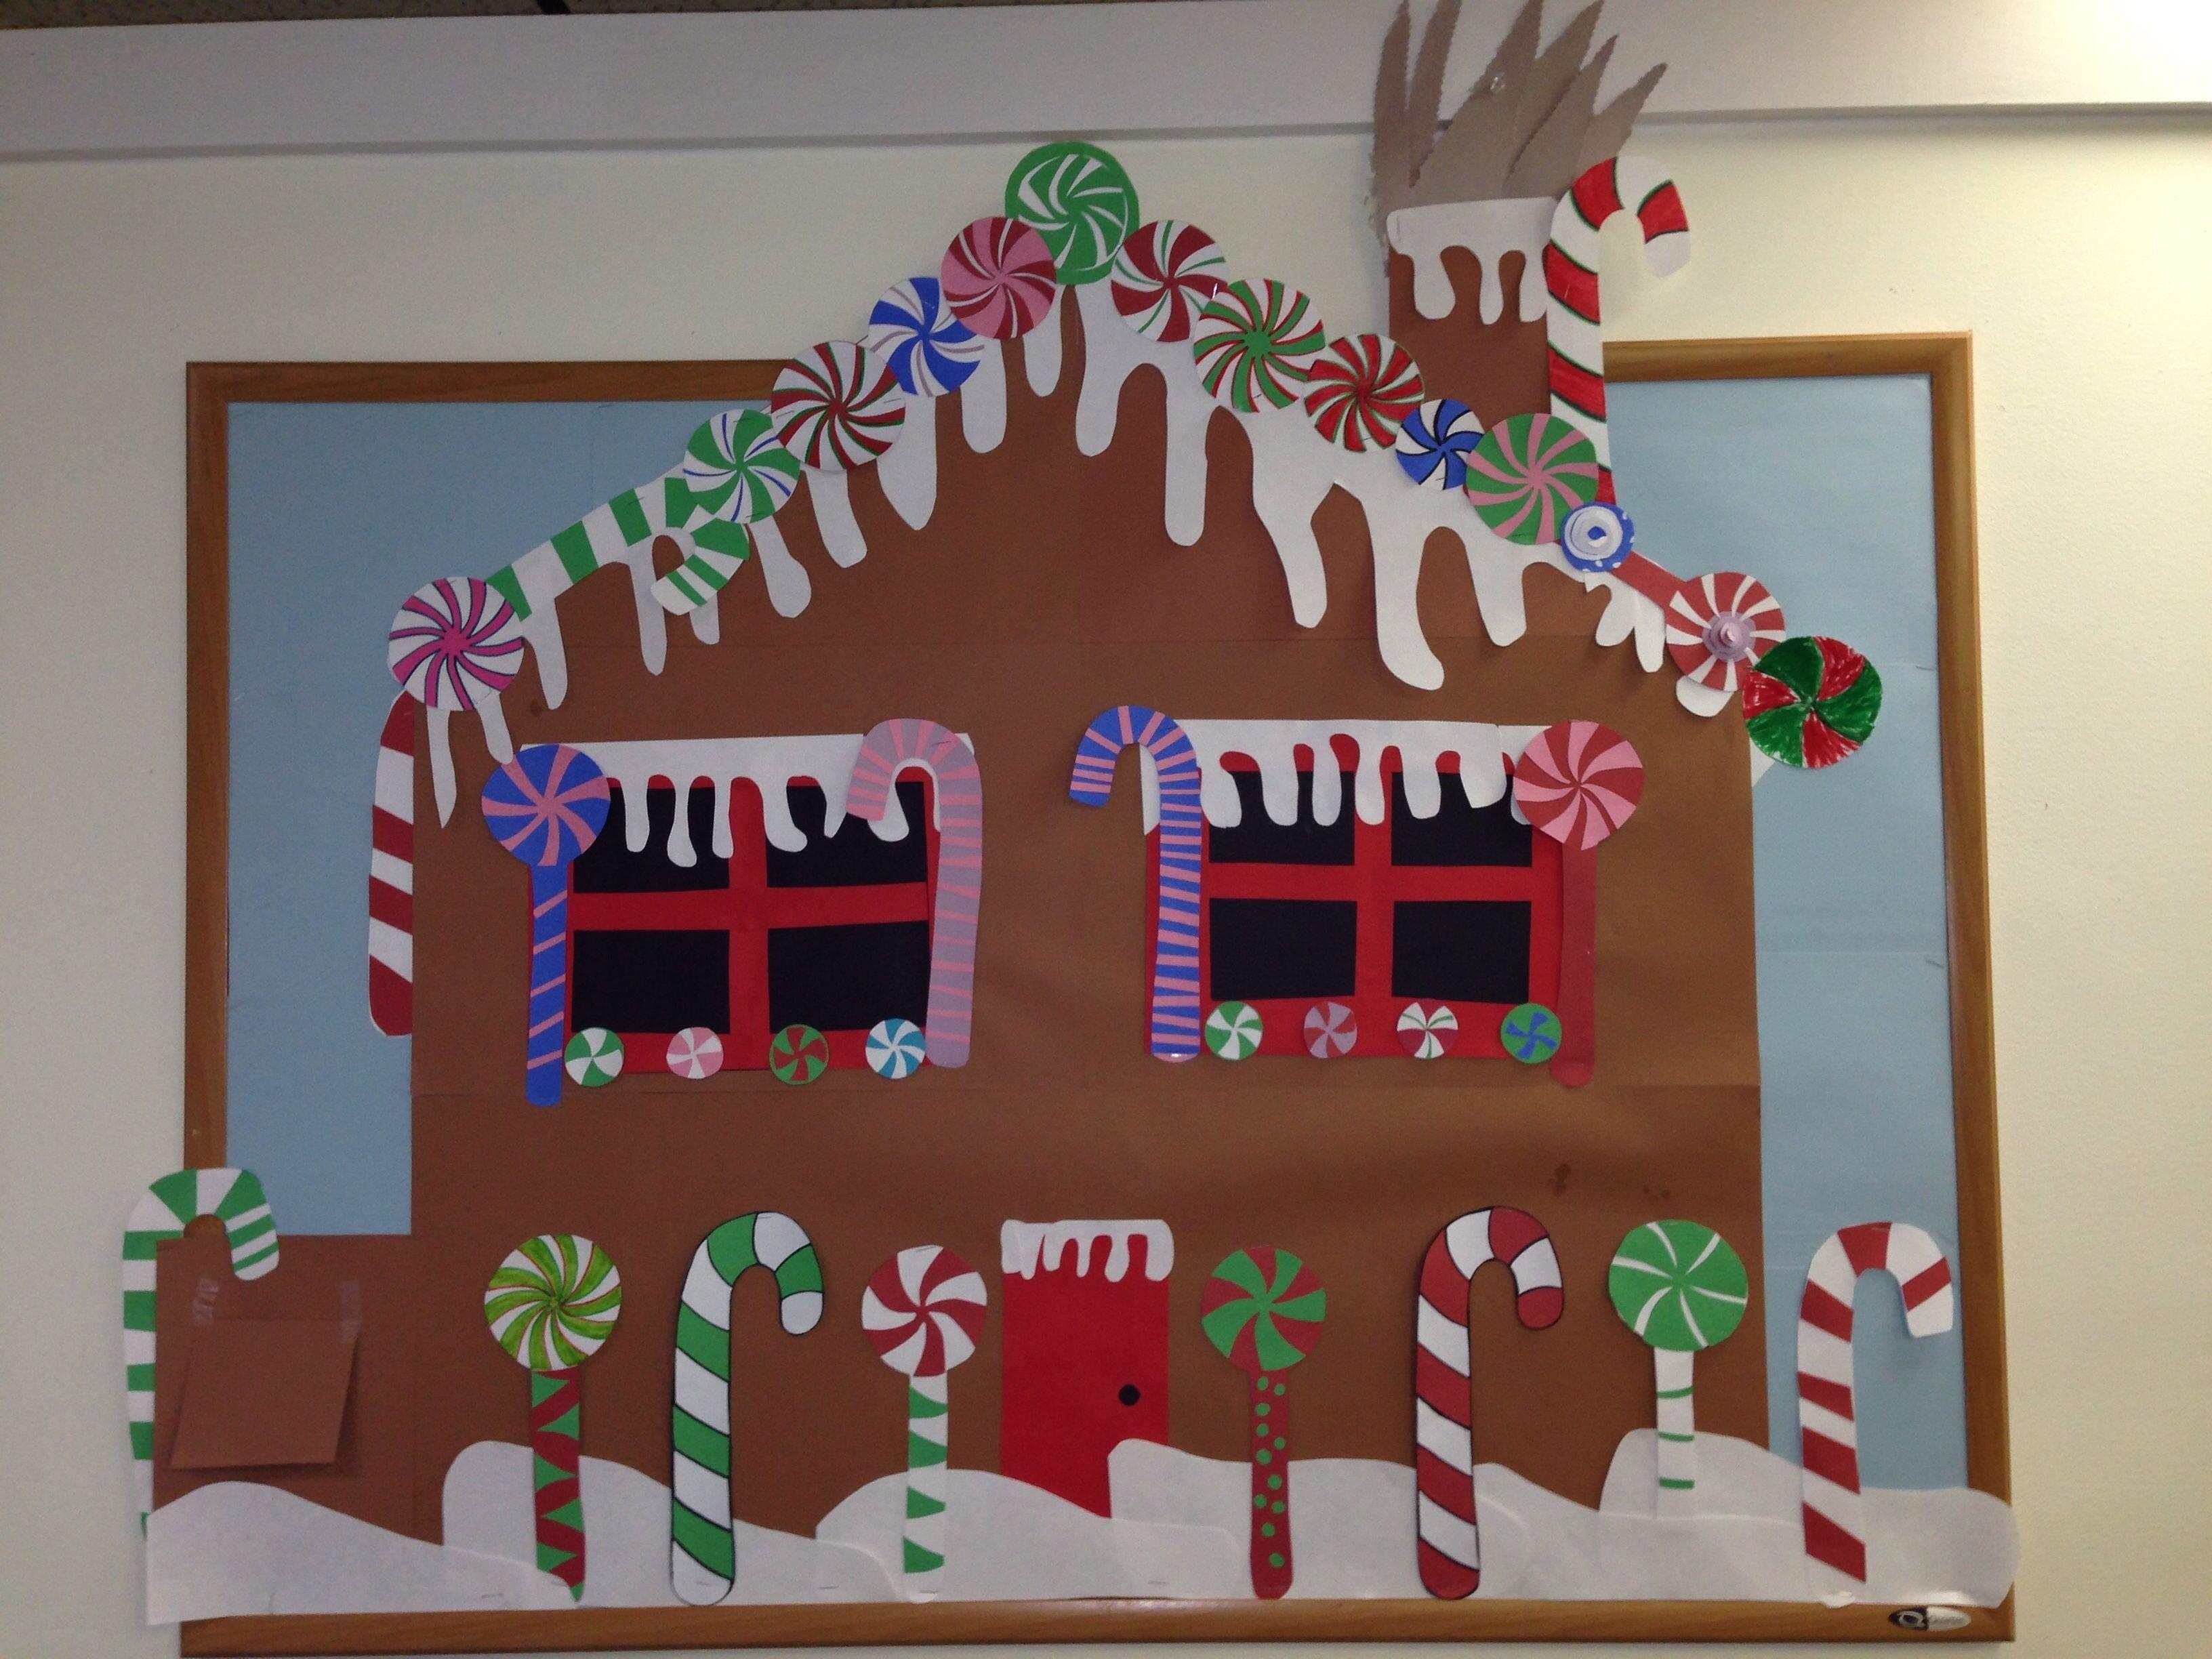 10 Perfect Gingerbread Man Bulletin Board Ideas gingerbread house candy christmas bulletin board christmas 2020